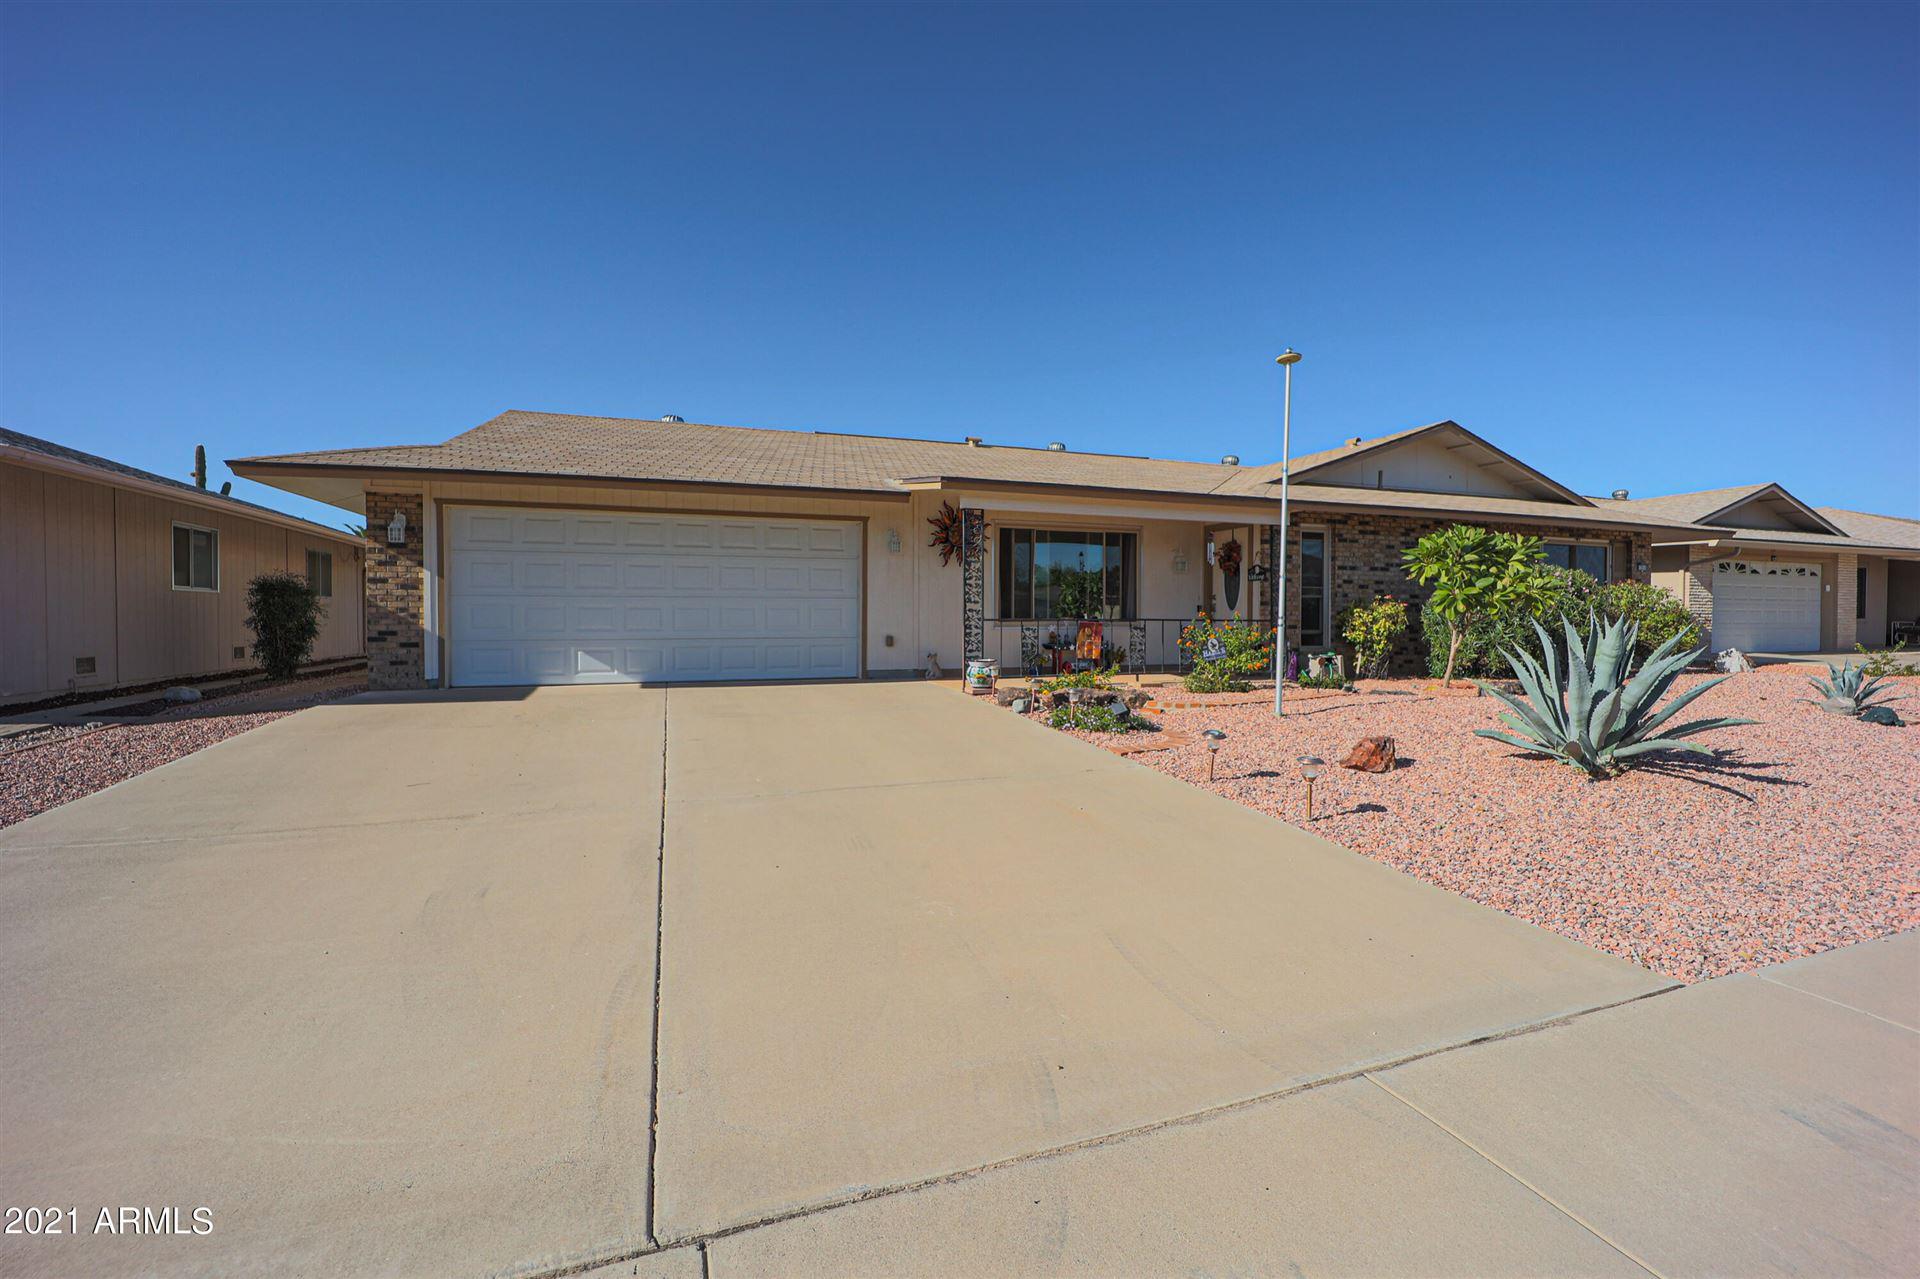 Photo of 12918 W LIMEWOOD Drive, Sun City West, AZ 85375 (MLS # 6307672)